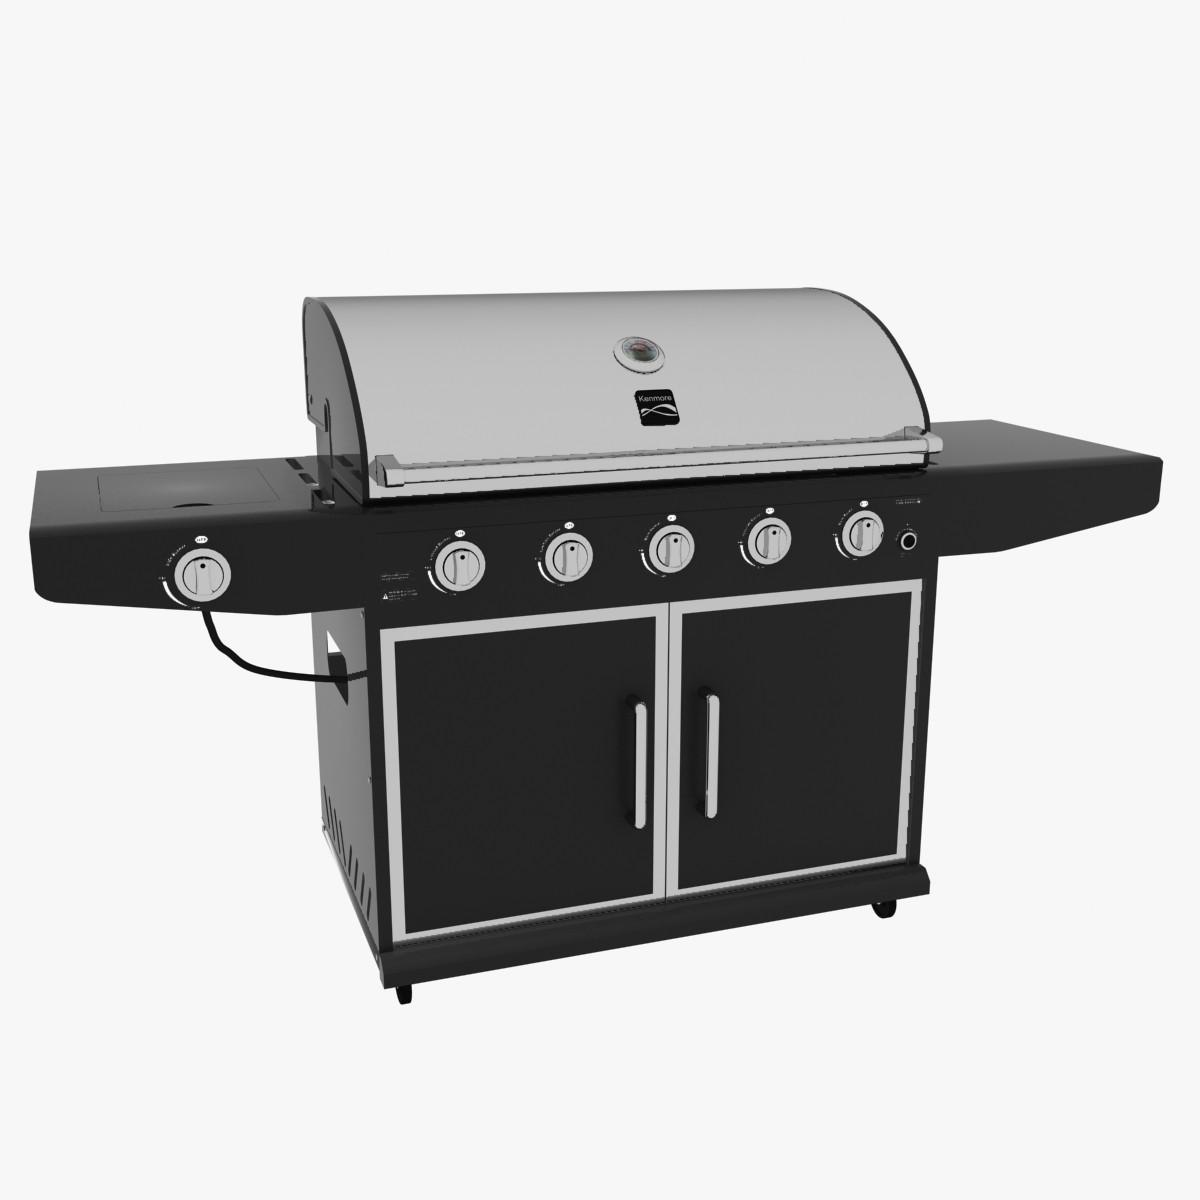 Barbecue_Model_Camera01_SI_1200.JPG